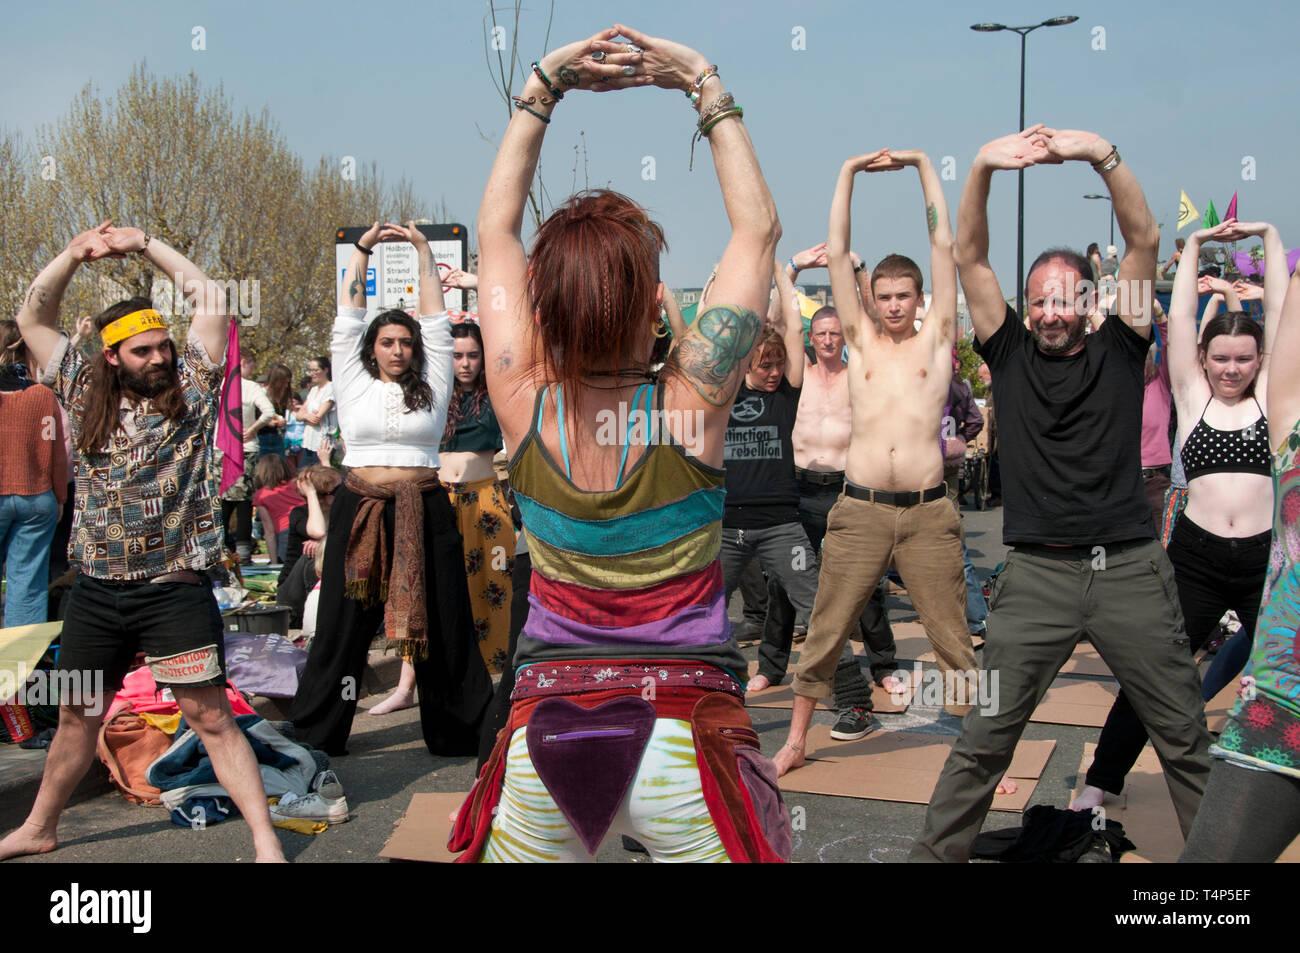 Extinction Rebellion protest, London. April 17th 2019. Waterloo Bridge. Yoga class. Stock Photo